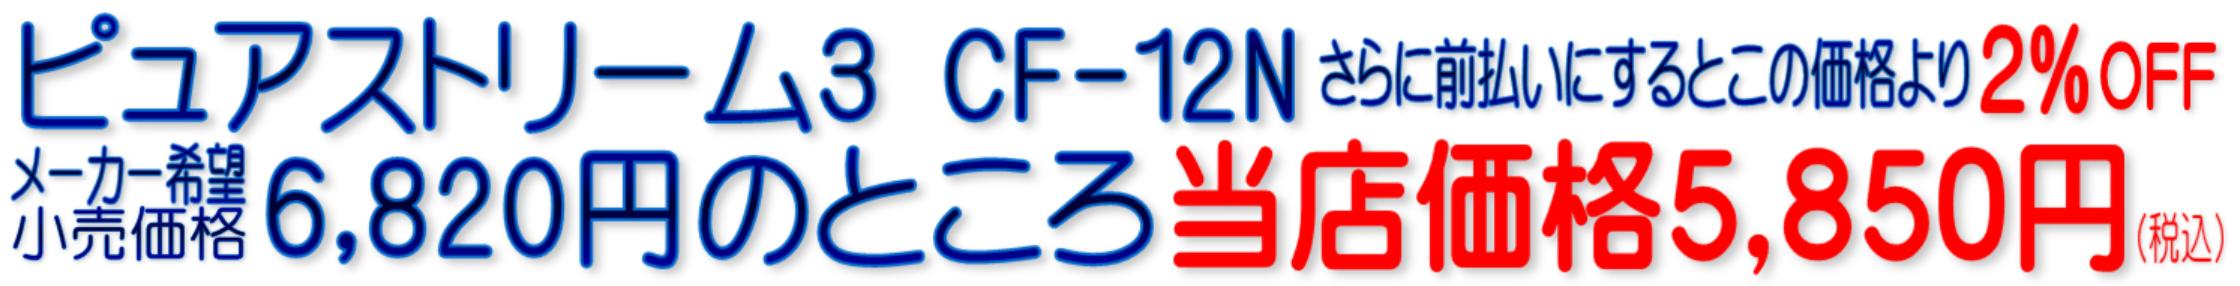 CF-12N ピュアストリーム3